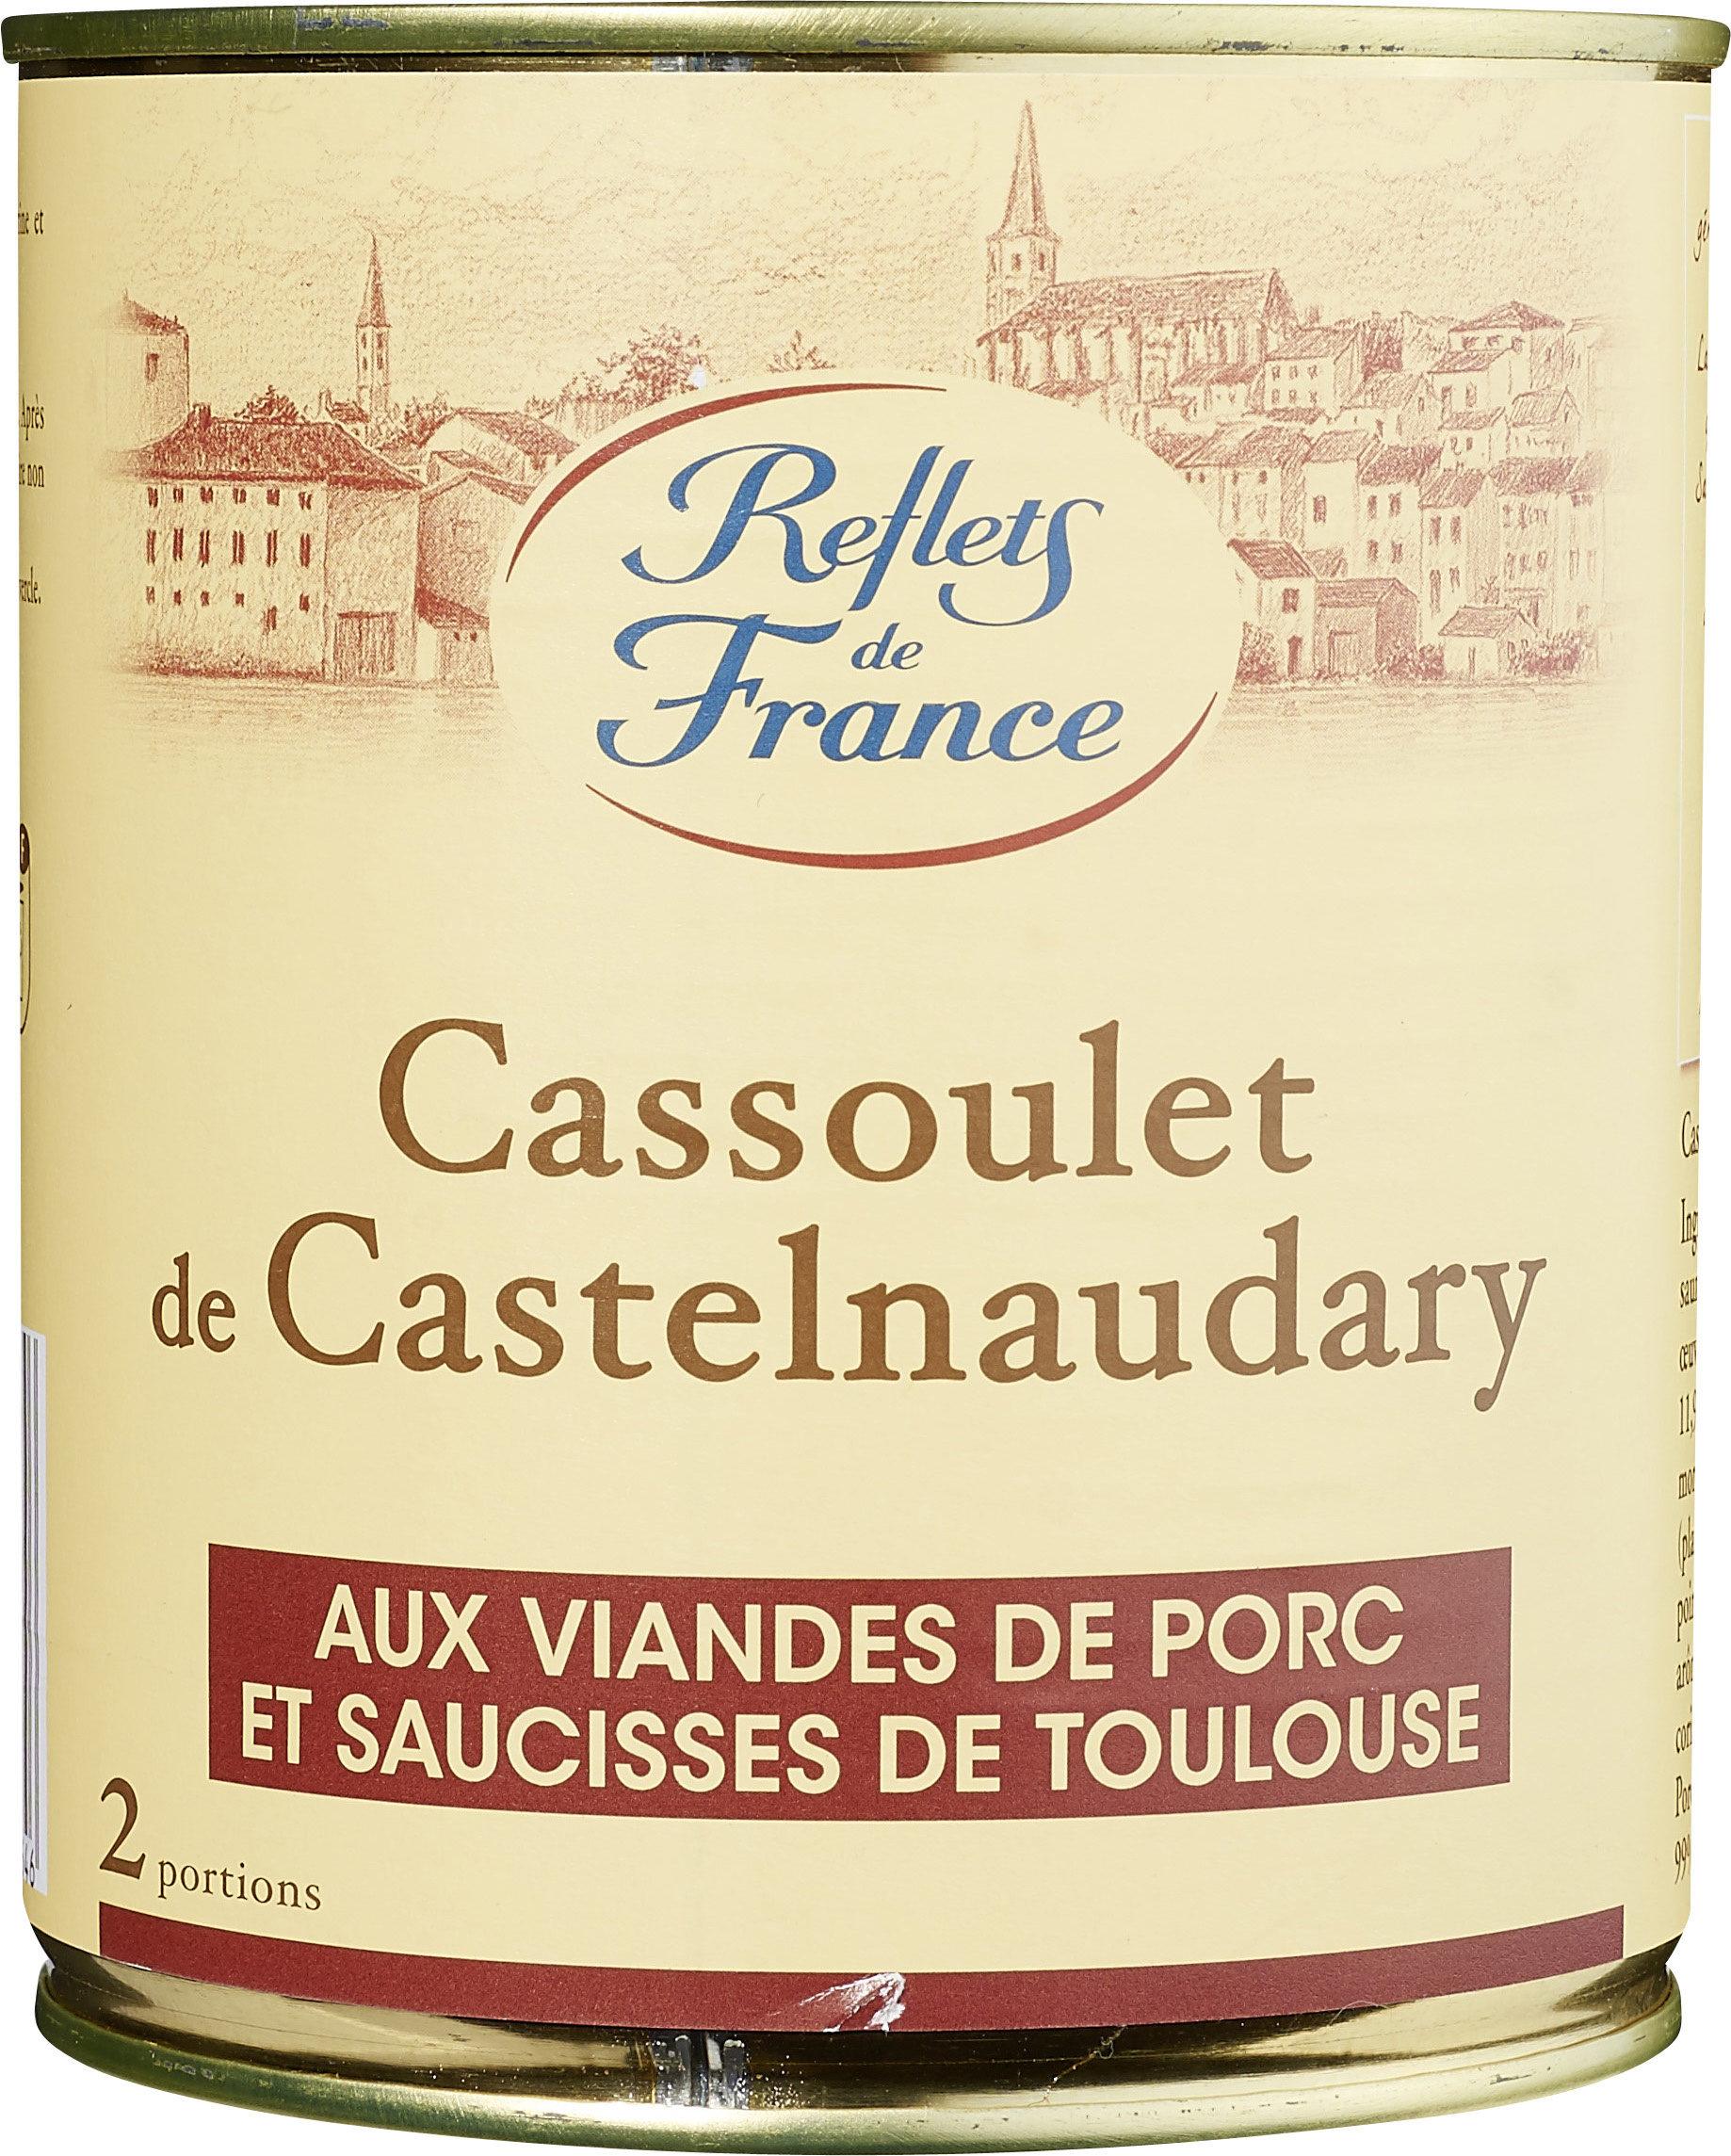 Cassoulet de Castelnaudary - Product - fr